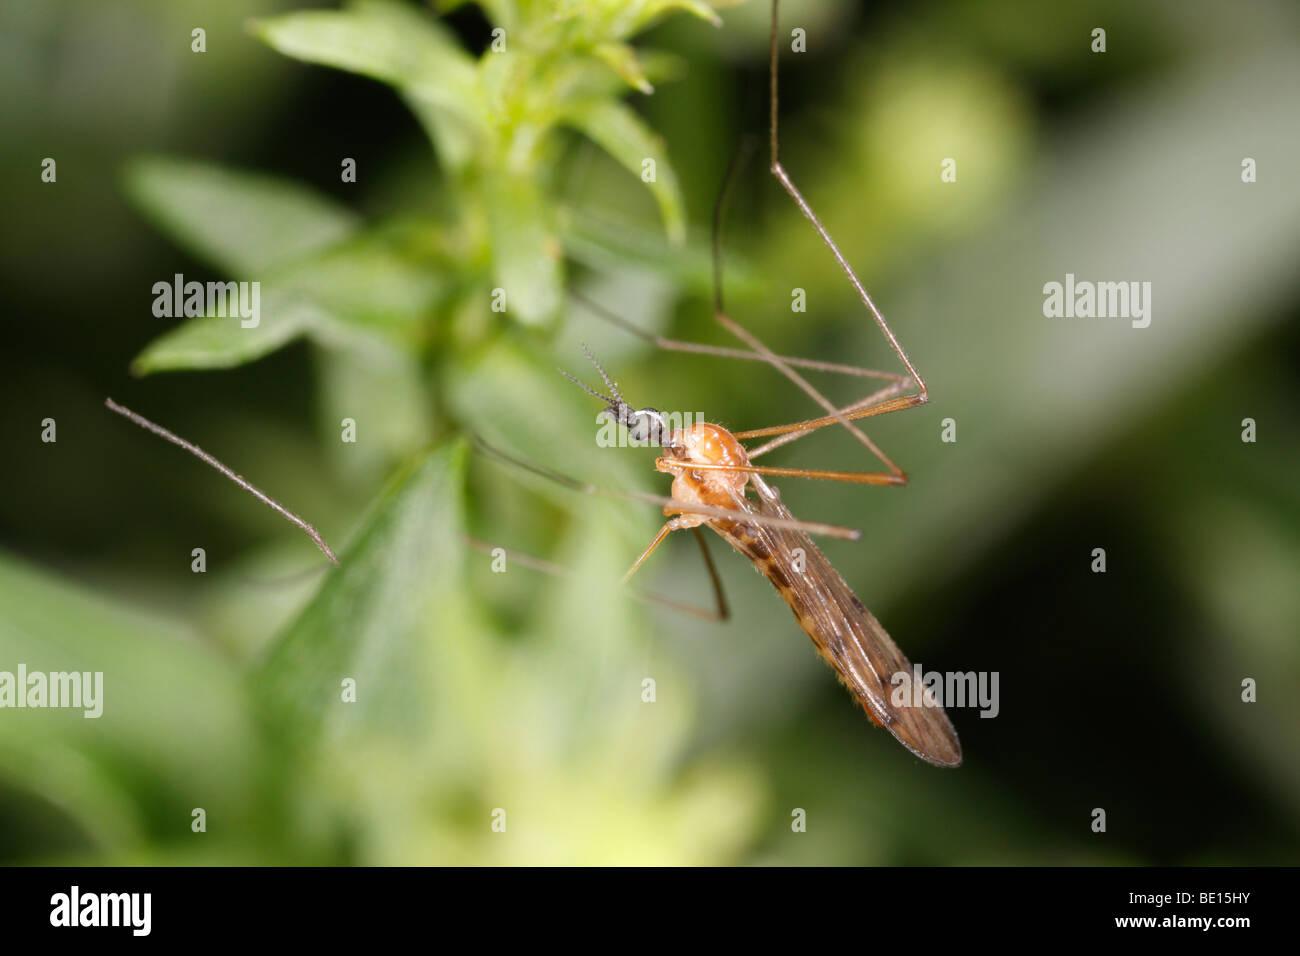 A midge, unfortunately, I cannot determine the species (Diptera) Stock Photo